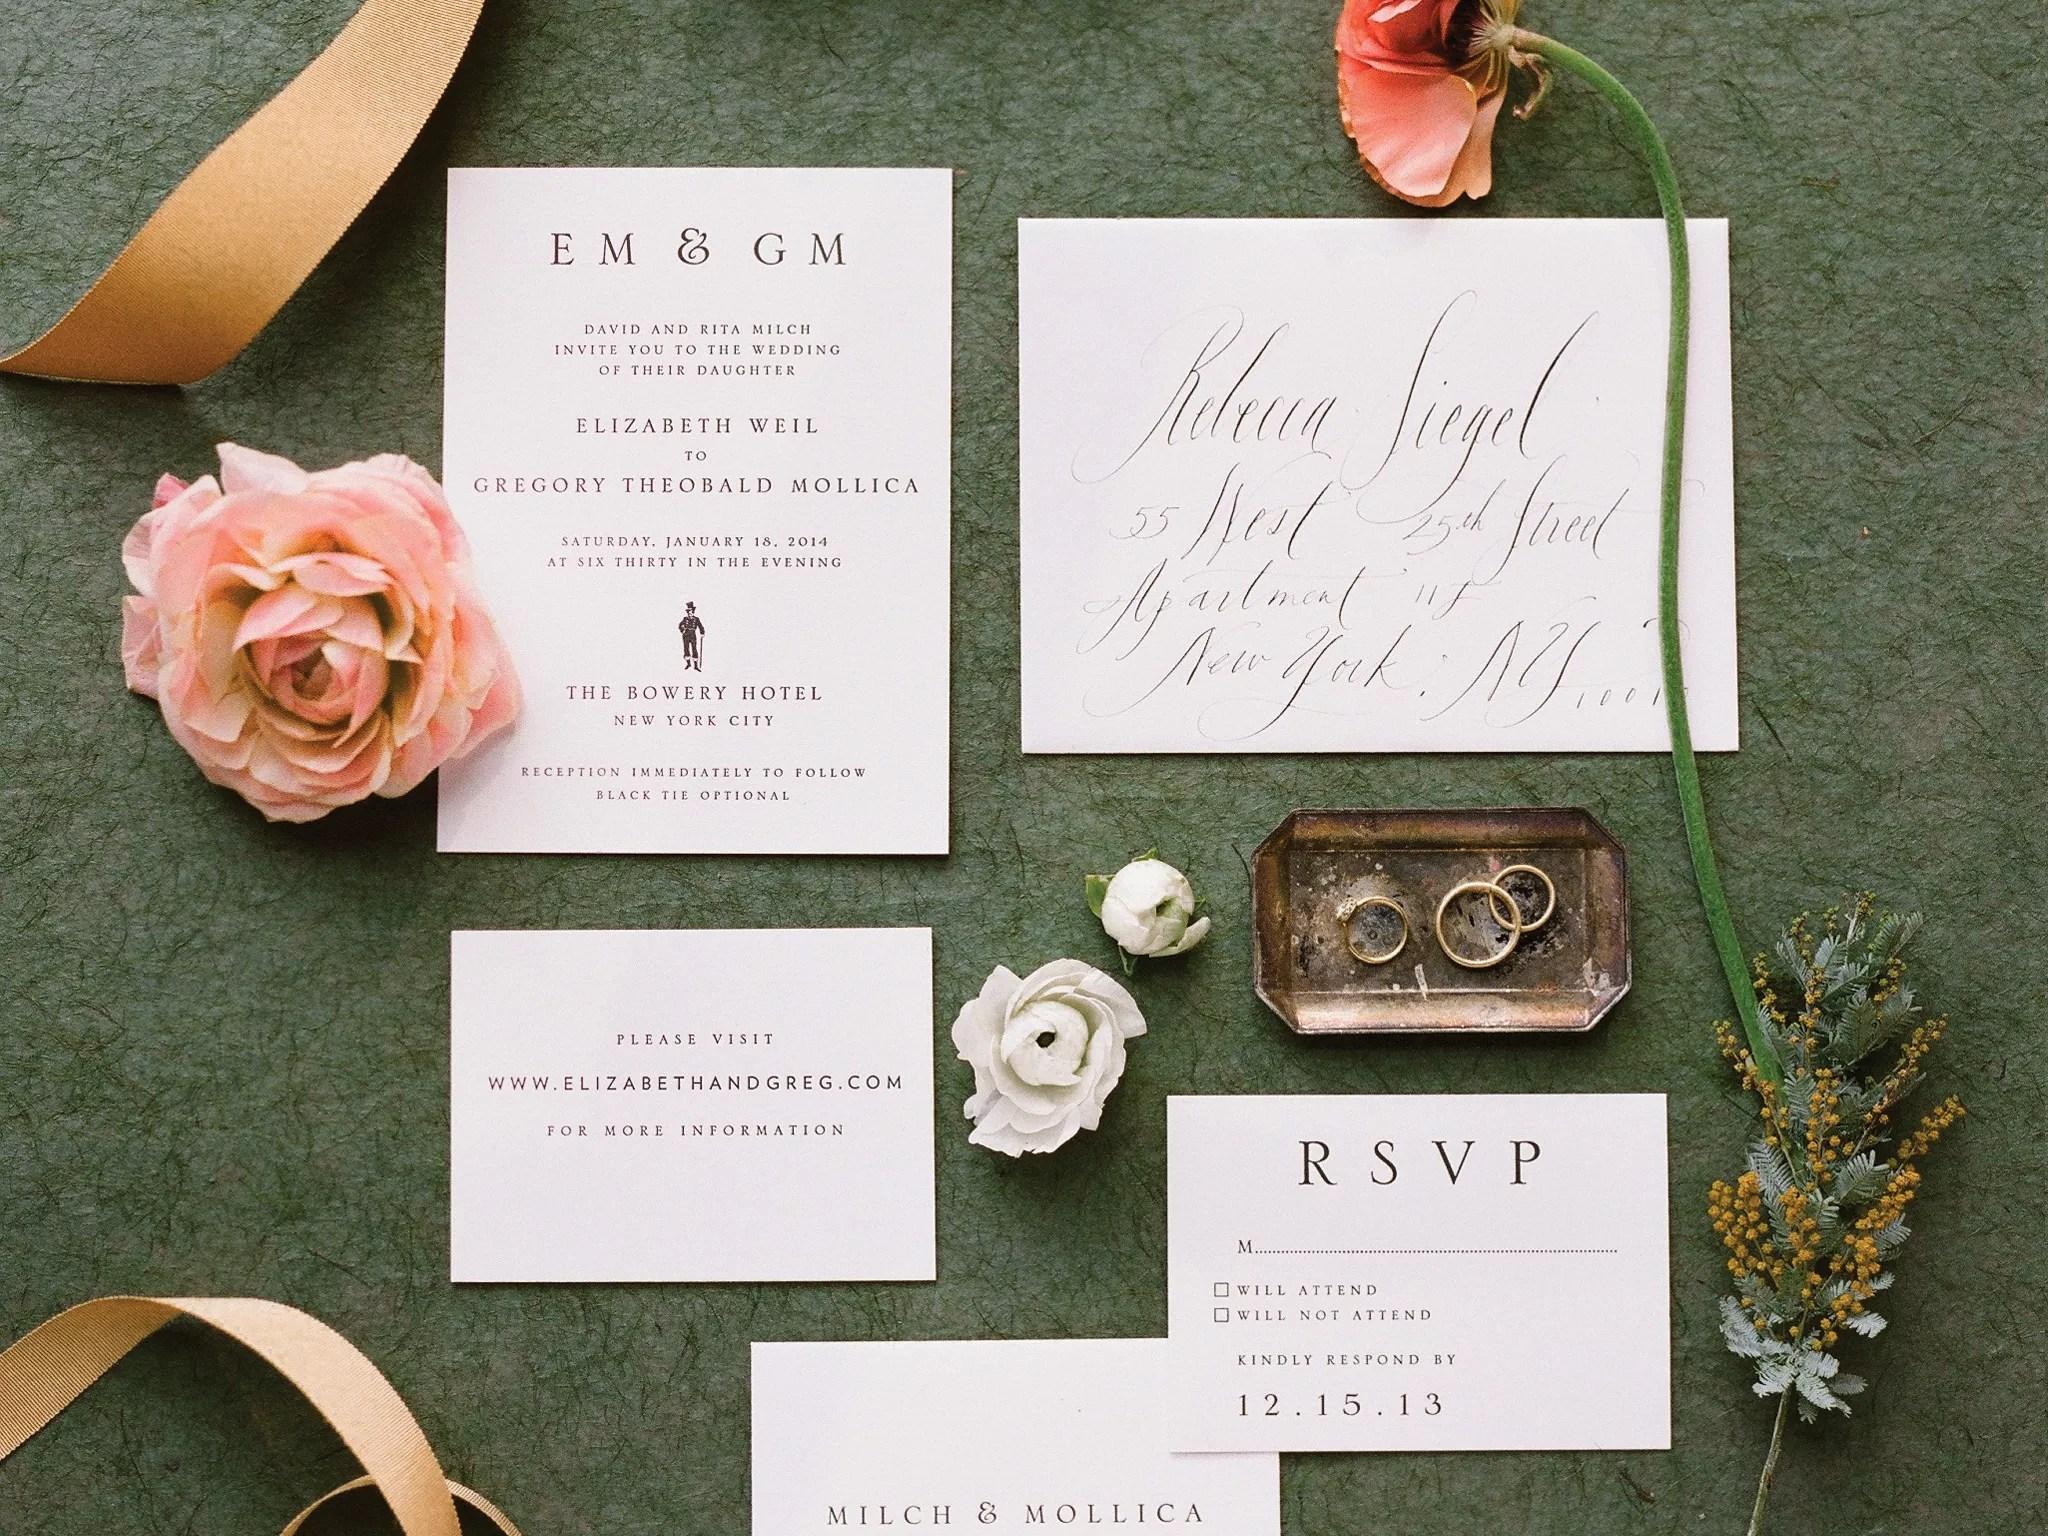 wedding invitations etiquette wedding stationery